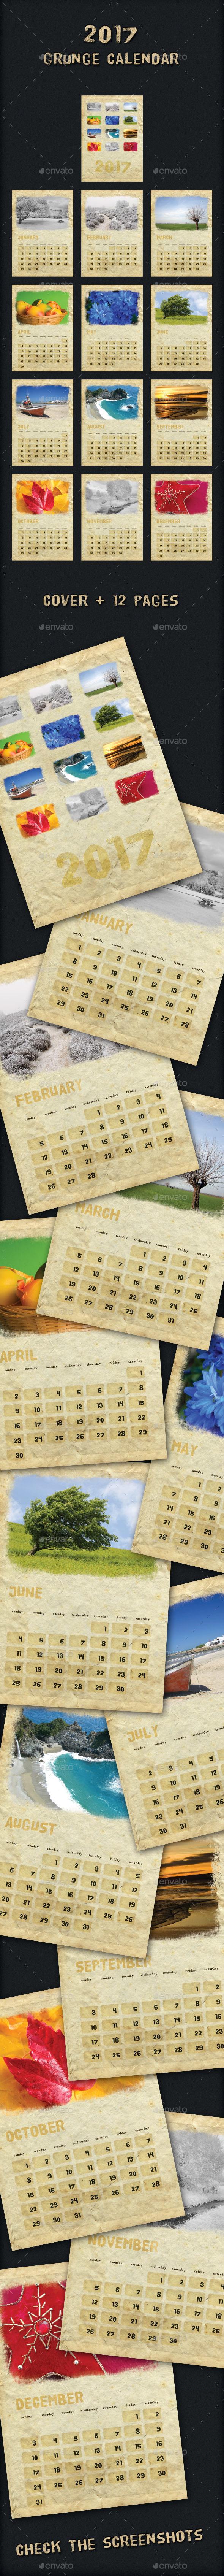 2017 Grunge Calendar - Calendars Stationery